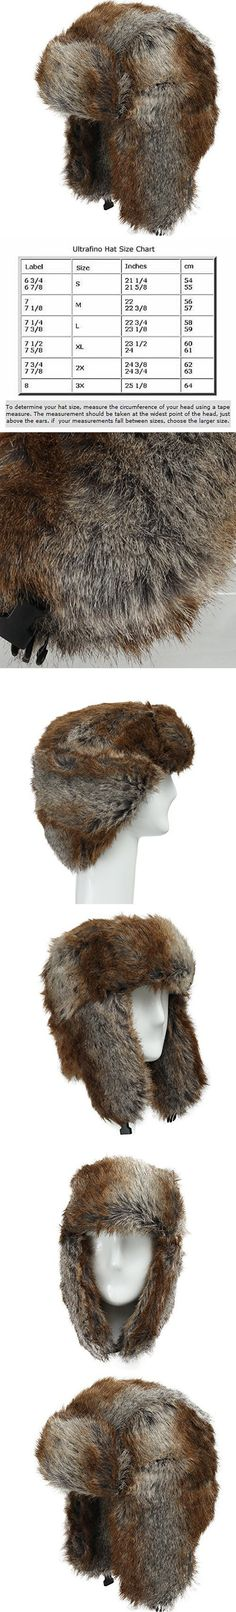 Explorer Ushanka Winter Trapper Faux Fur Pilot Hat with Ear Flaps CHOCOLATE 7